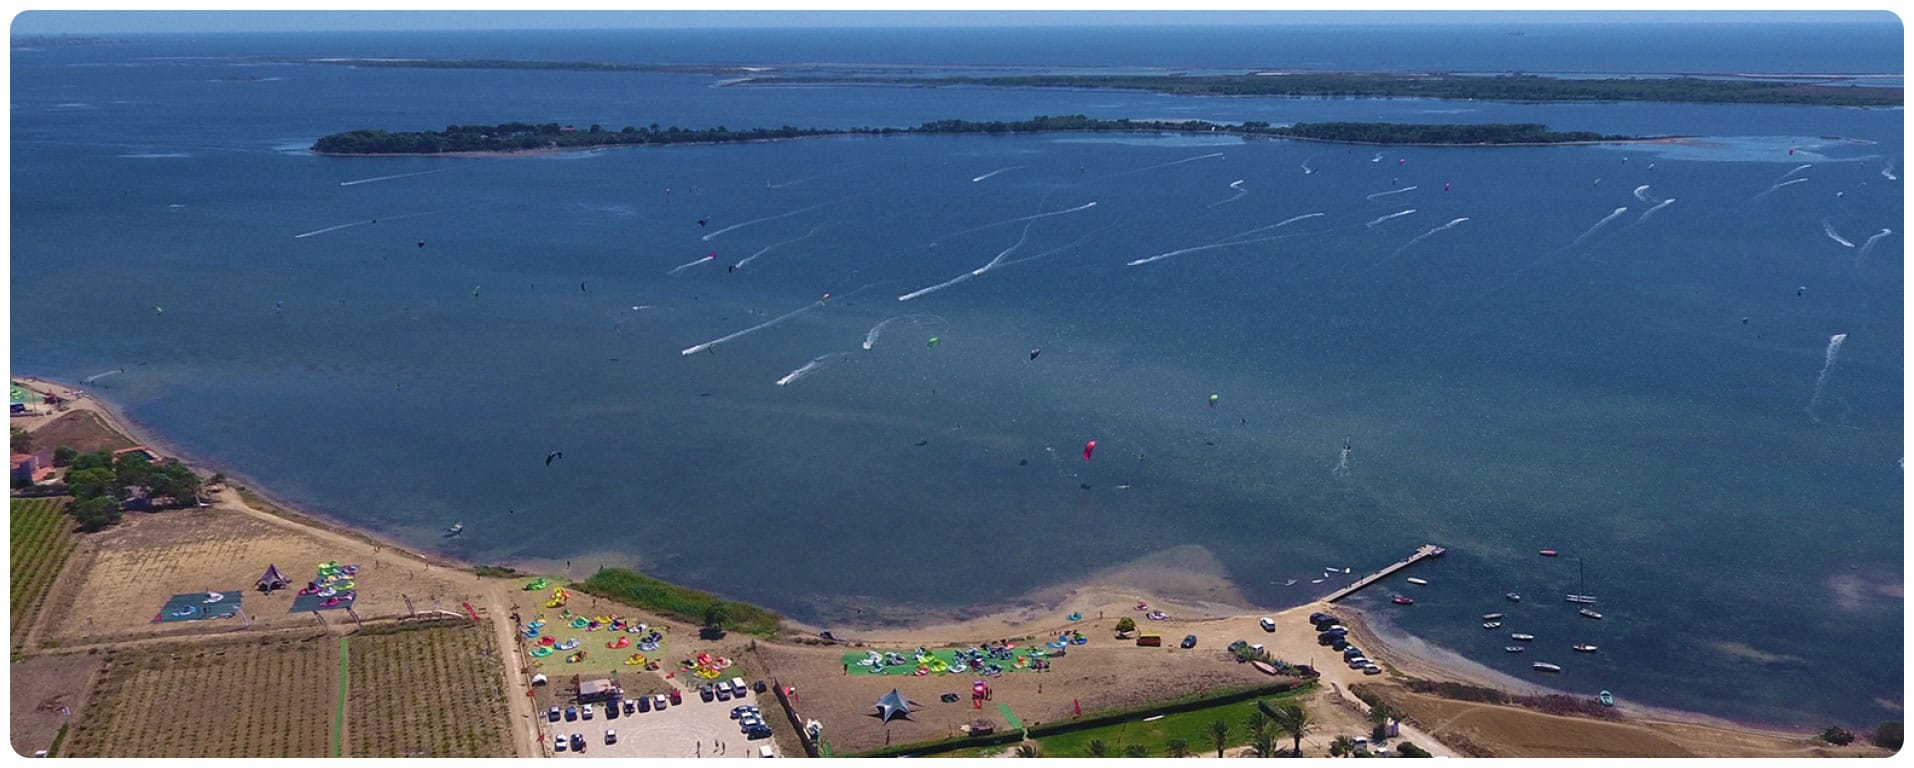 kitesurf-lo-stagnone-sicily-lagoon-flow-kite-school-drone-duotone-ozone